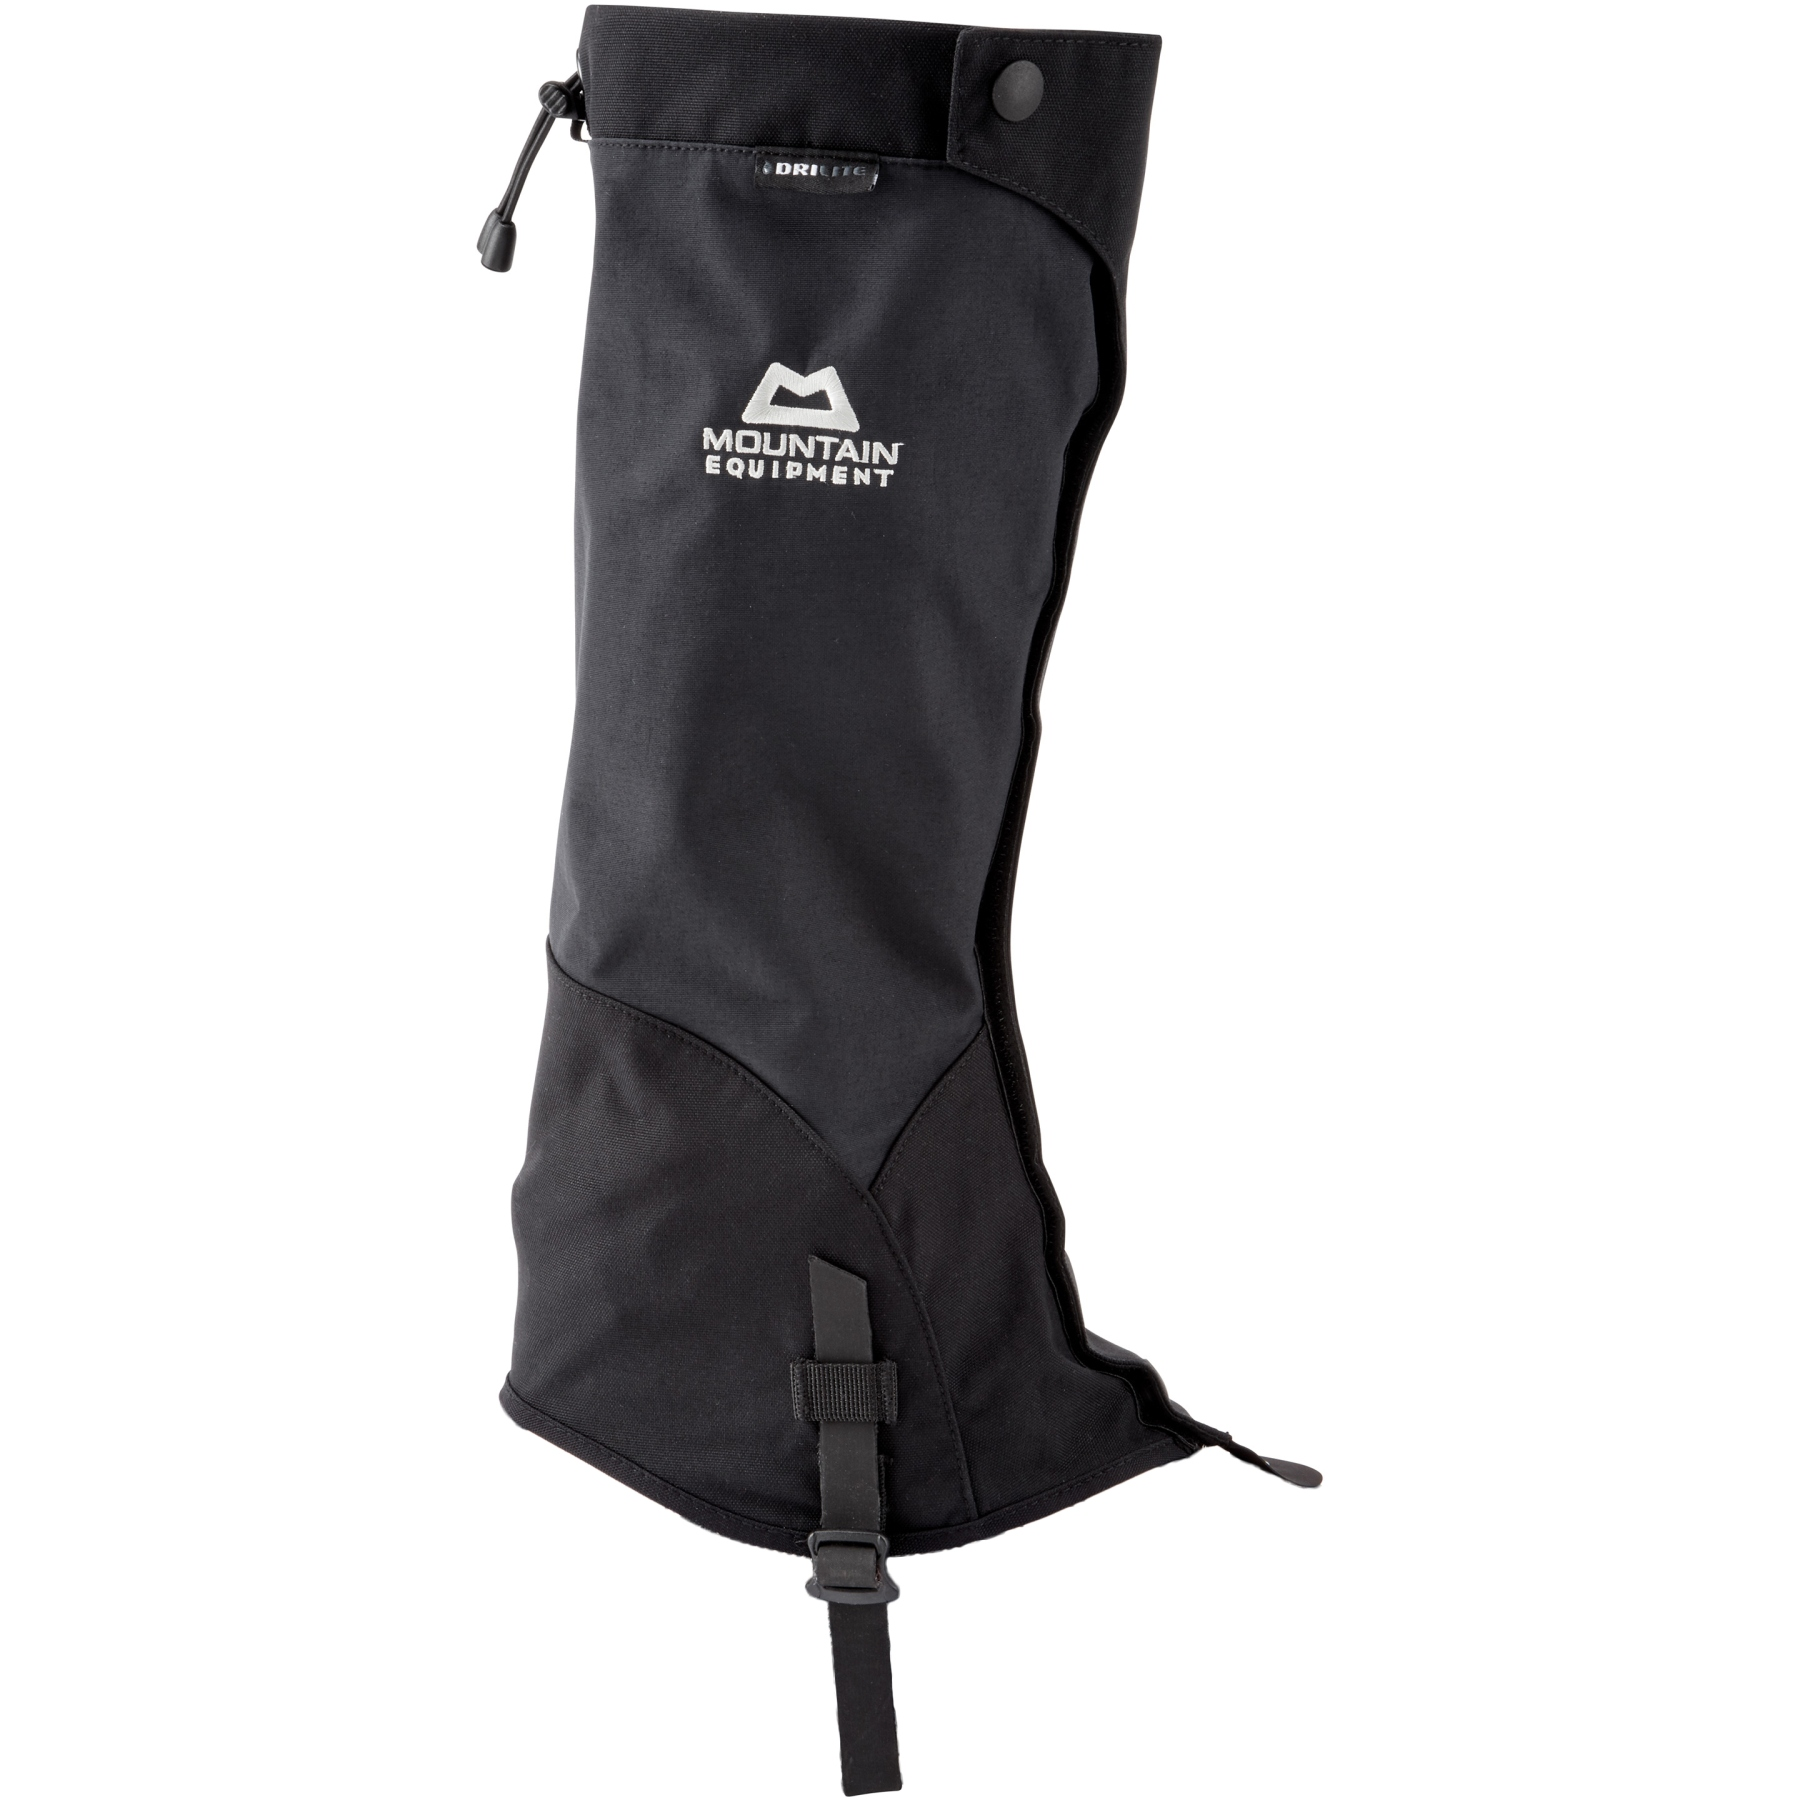 Mountain Equipment Alpine Pro Shell Gaiters 27558 - Black